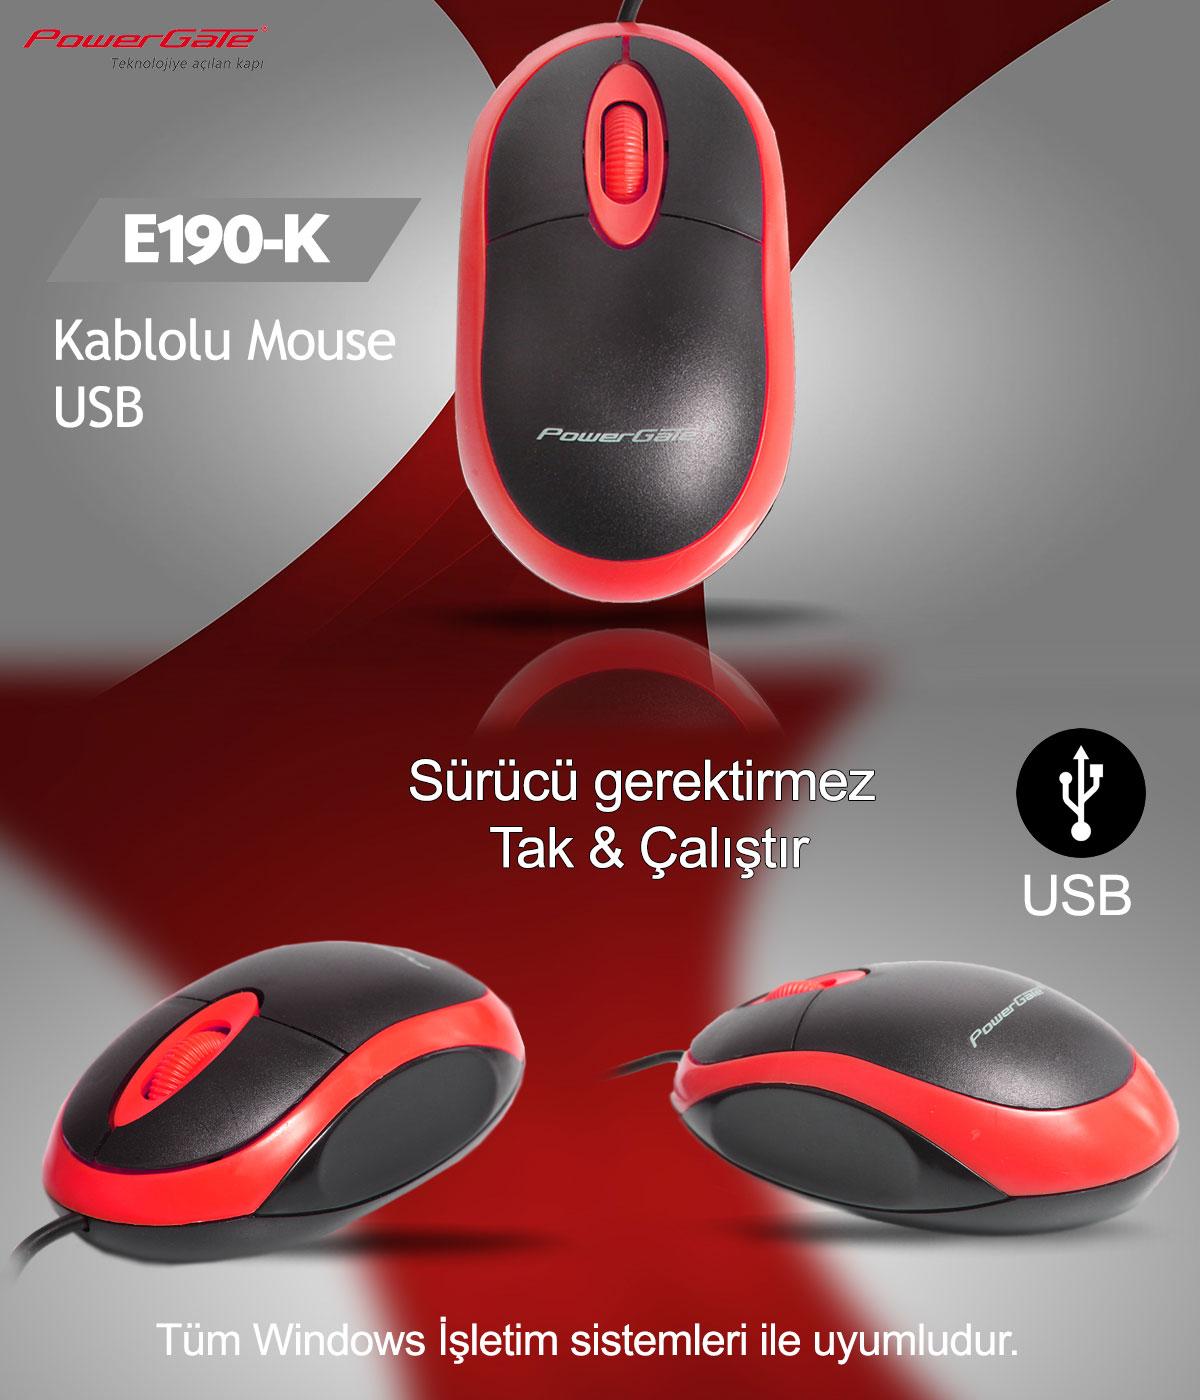 E190-K